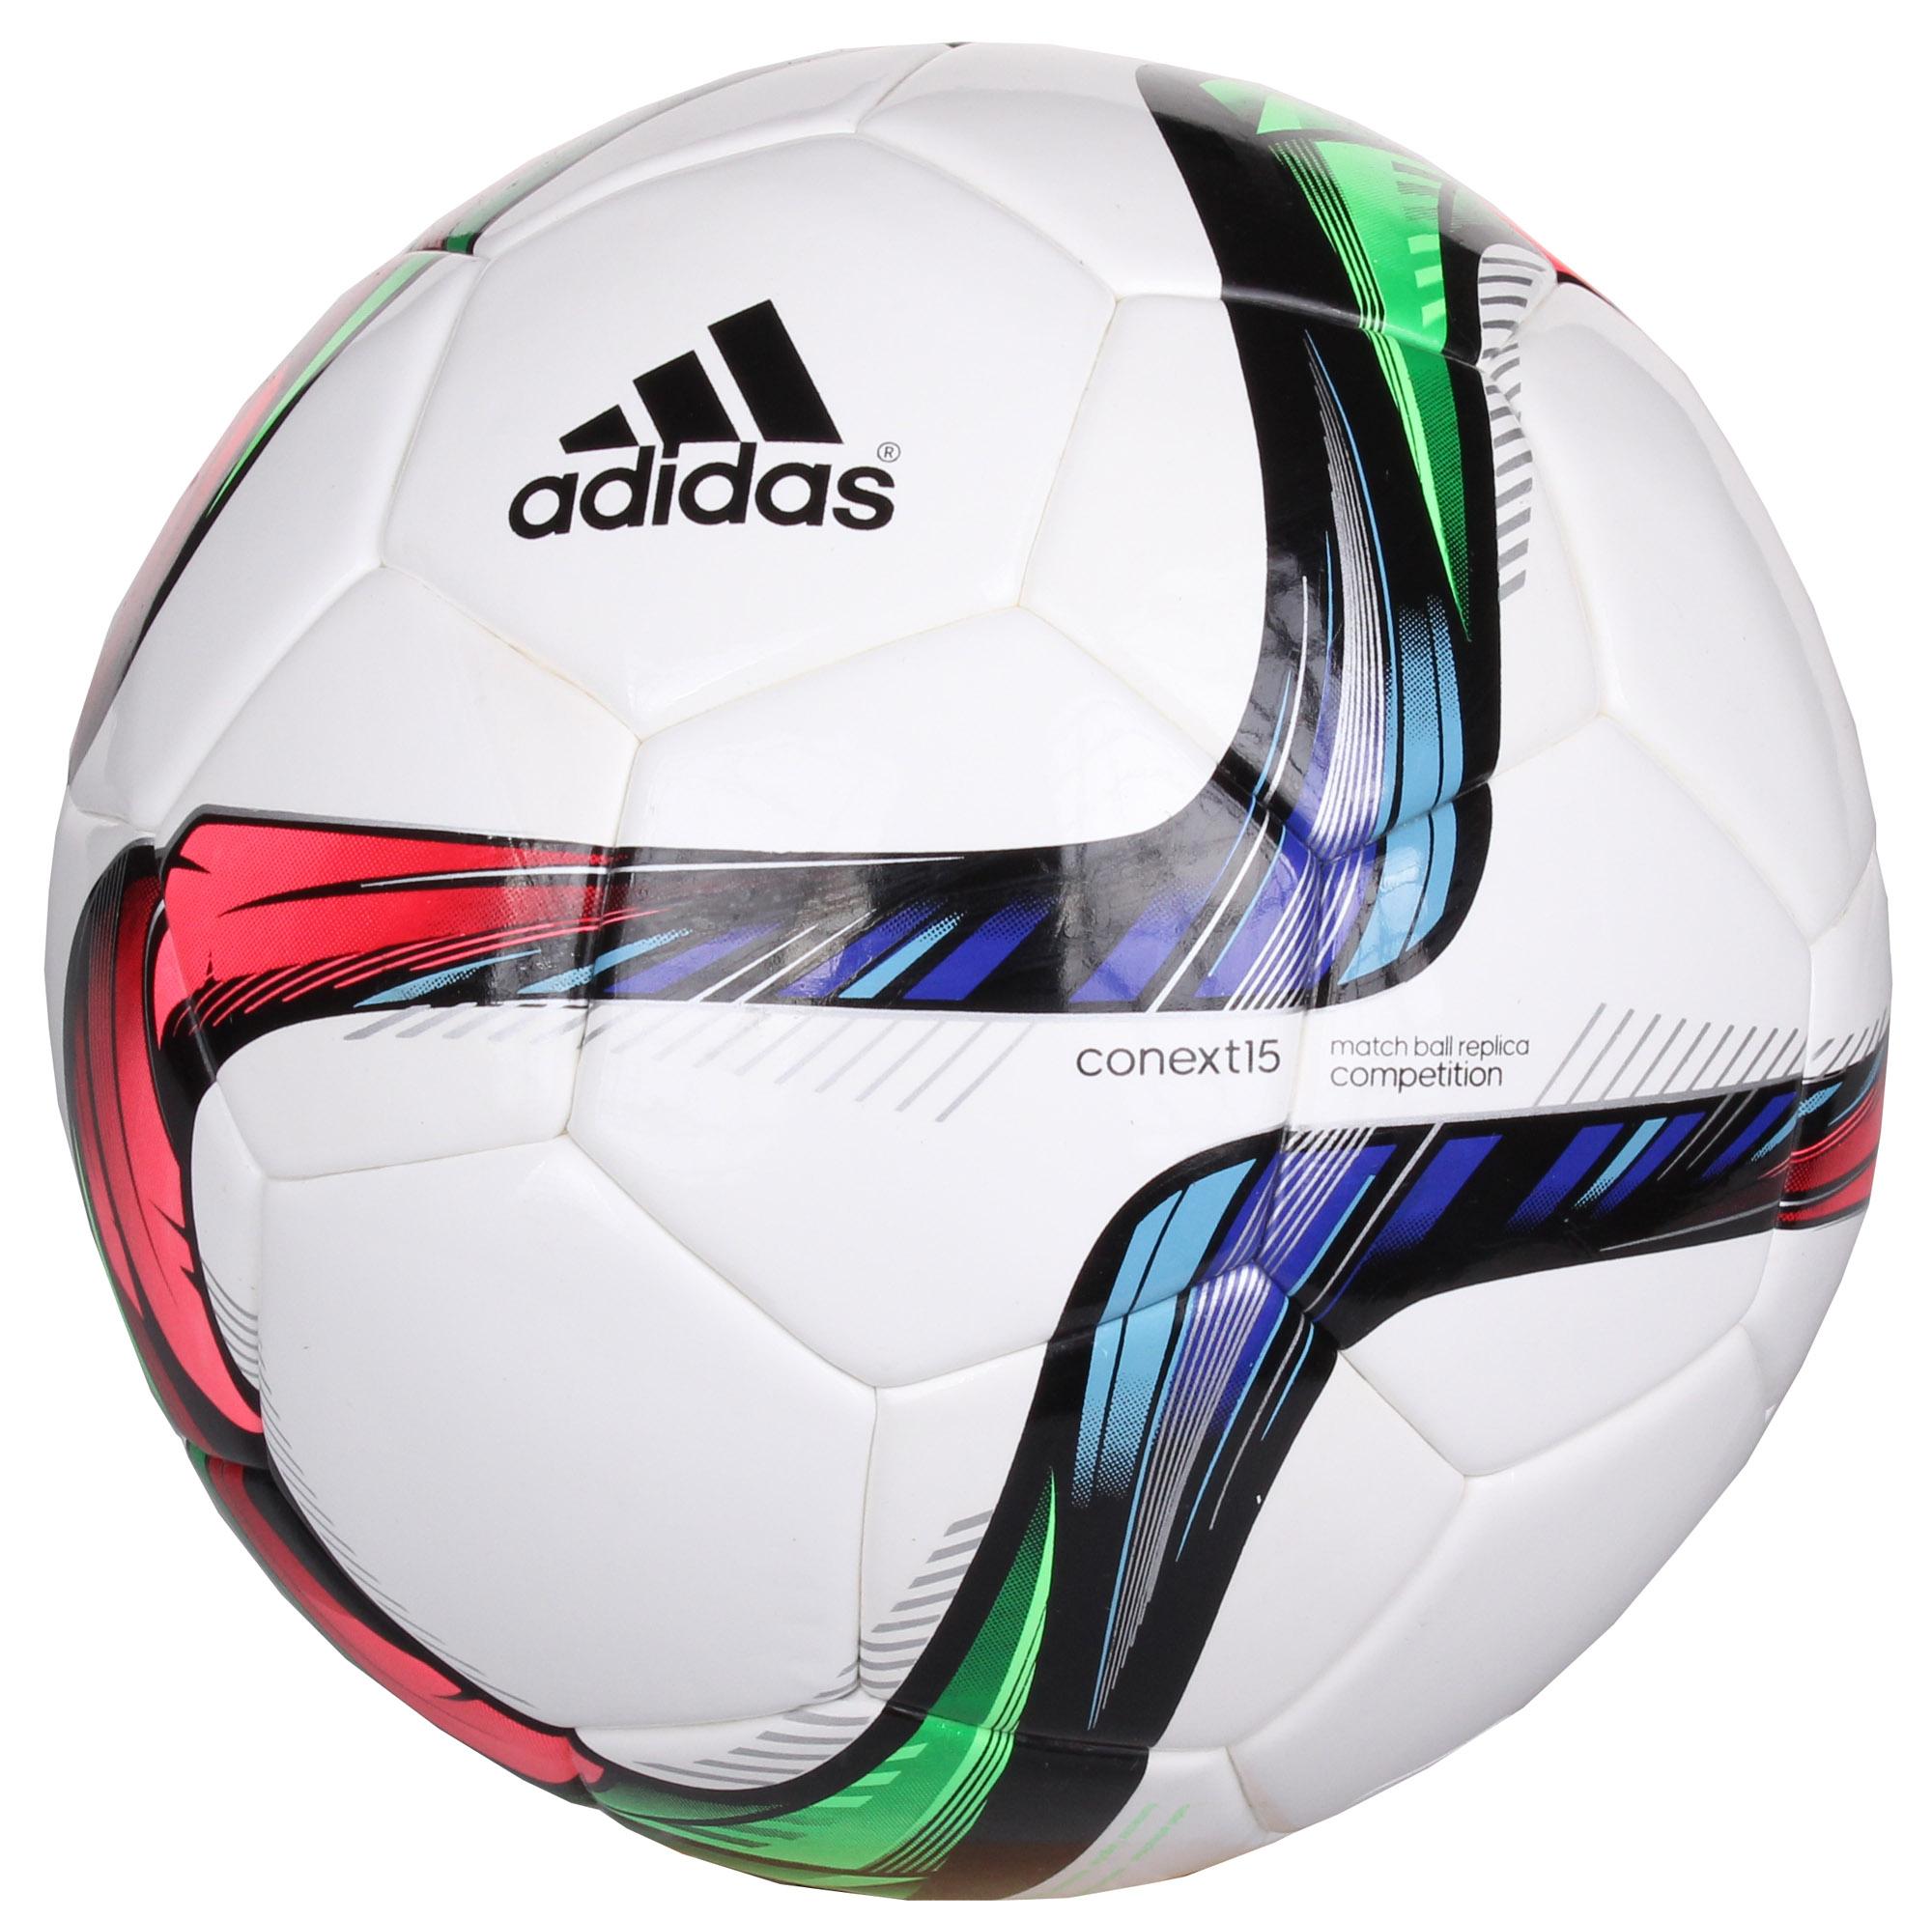 ADIDAS Conext15 Competition fotbalový míč - vel. 4